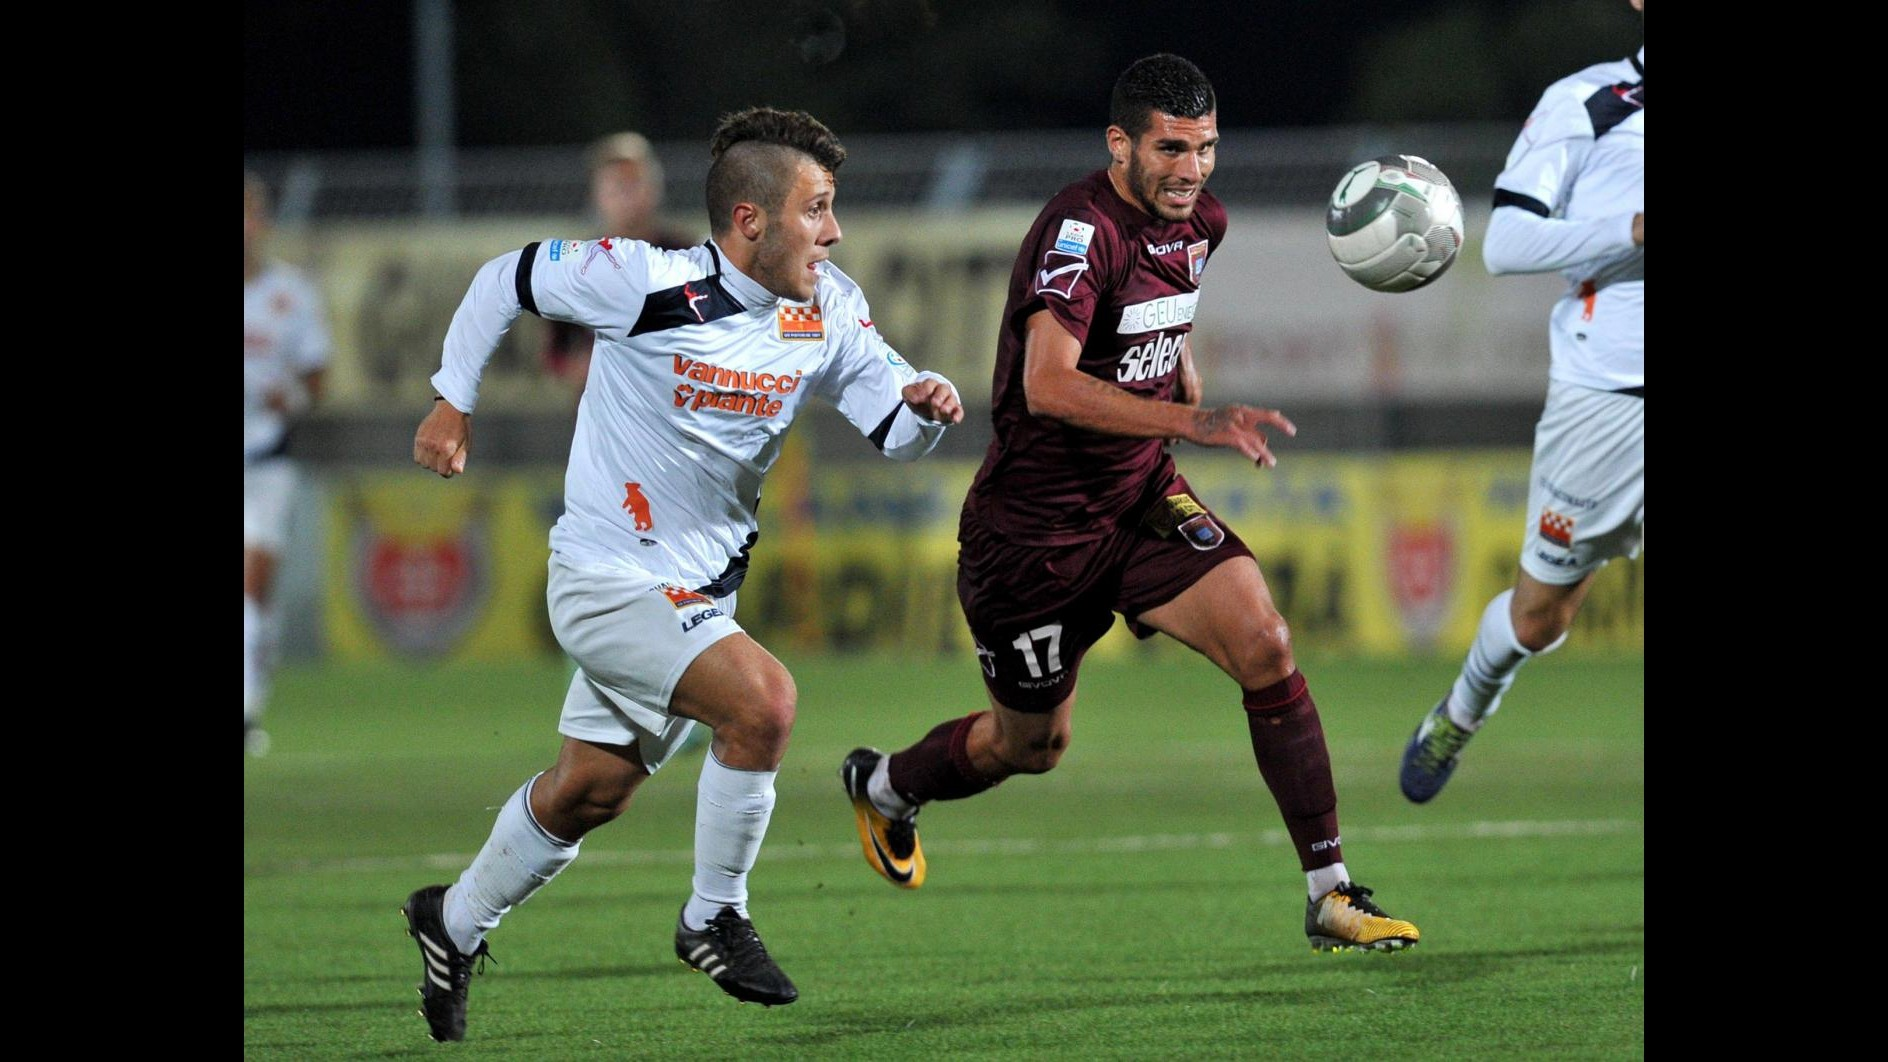 Serie C, Pontedera-Pistoiese 2-2